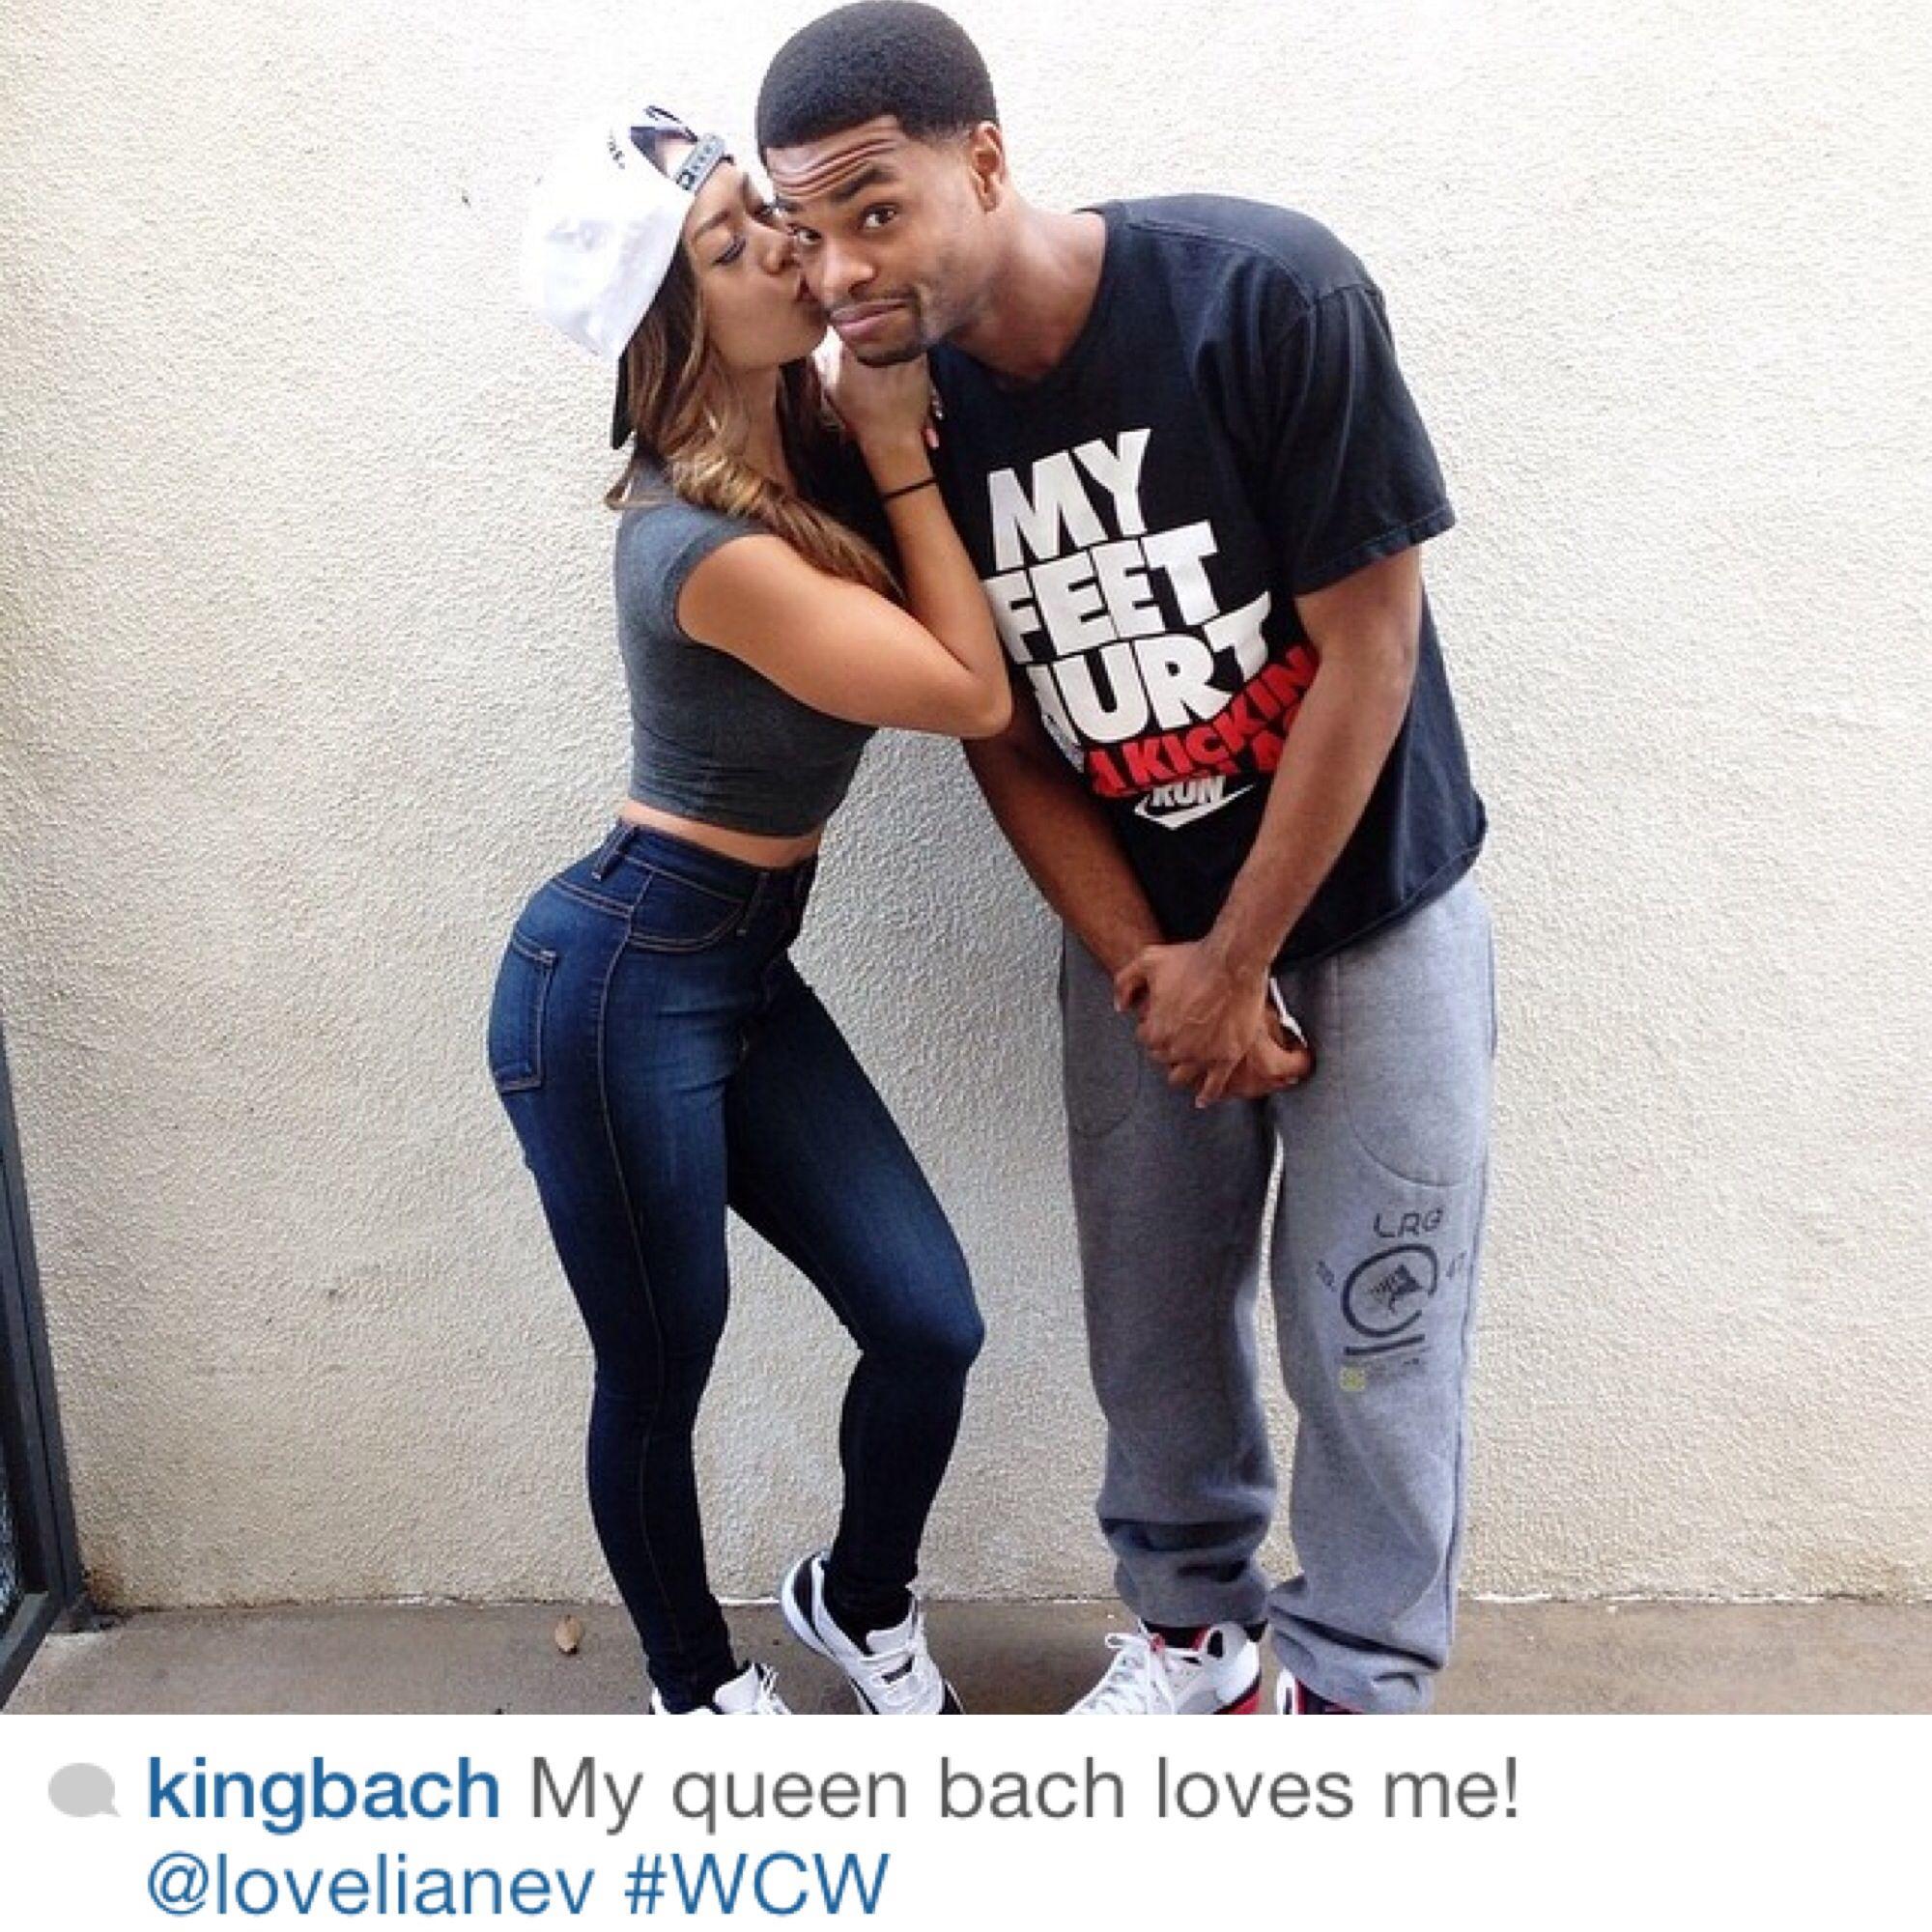 king bach